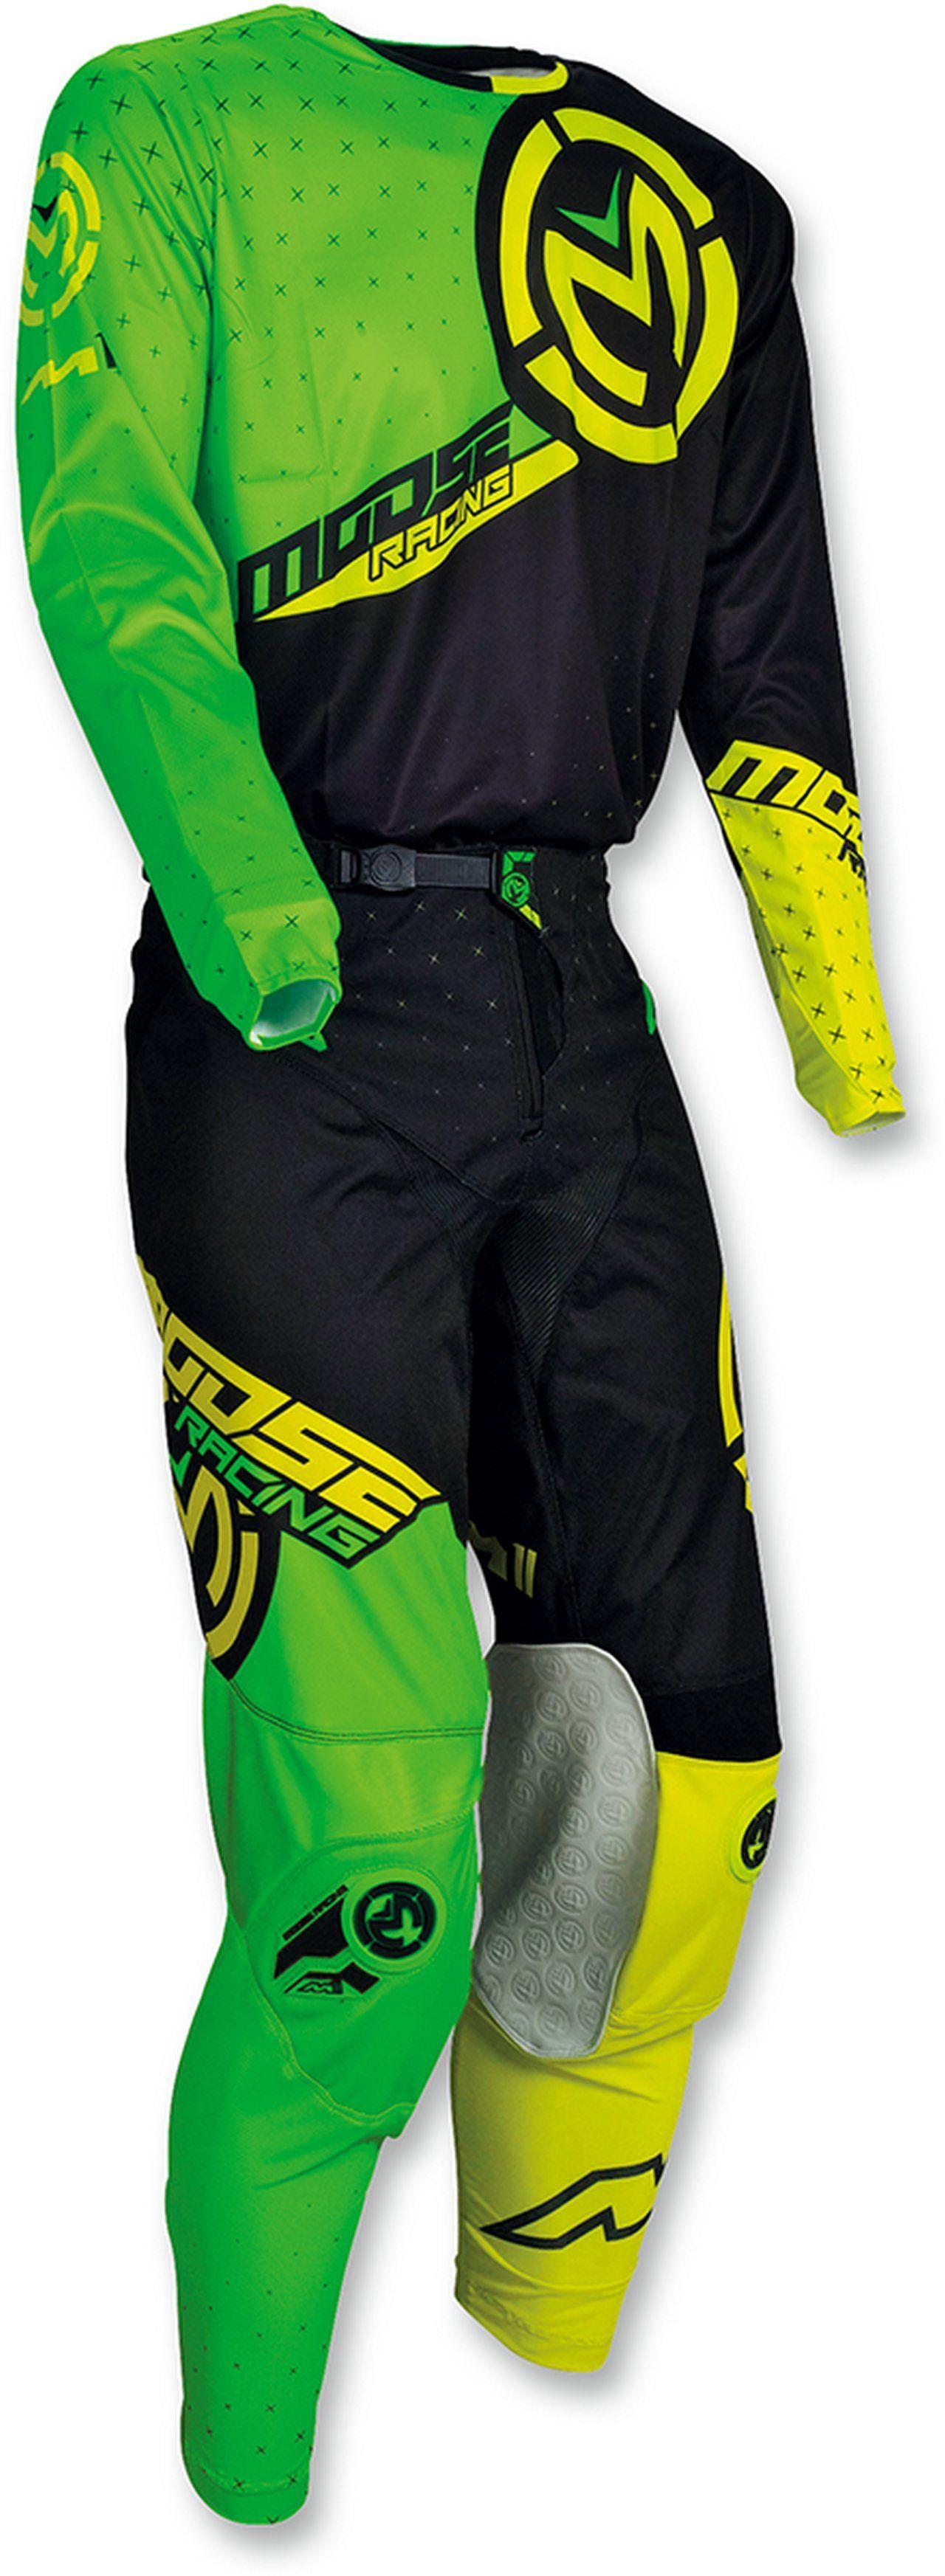 【MOOSE RACING】M1 越野車褲 [2901-6640] - 「Webike-摩托百貨」